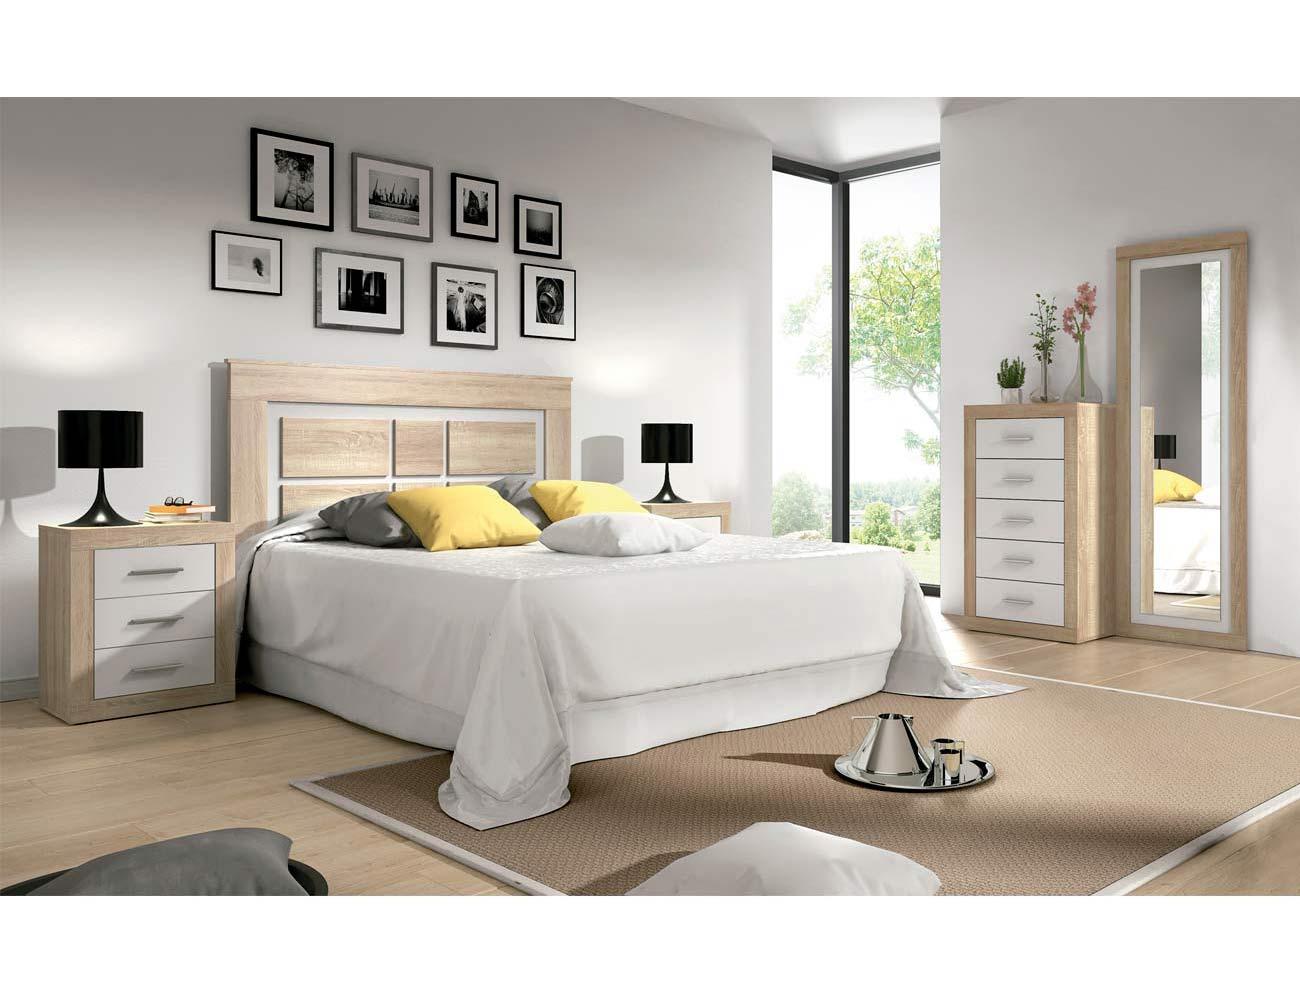 02 dormitorio matrimonio sinfonier cambrian blanco1